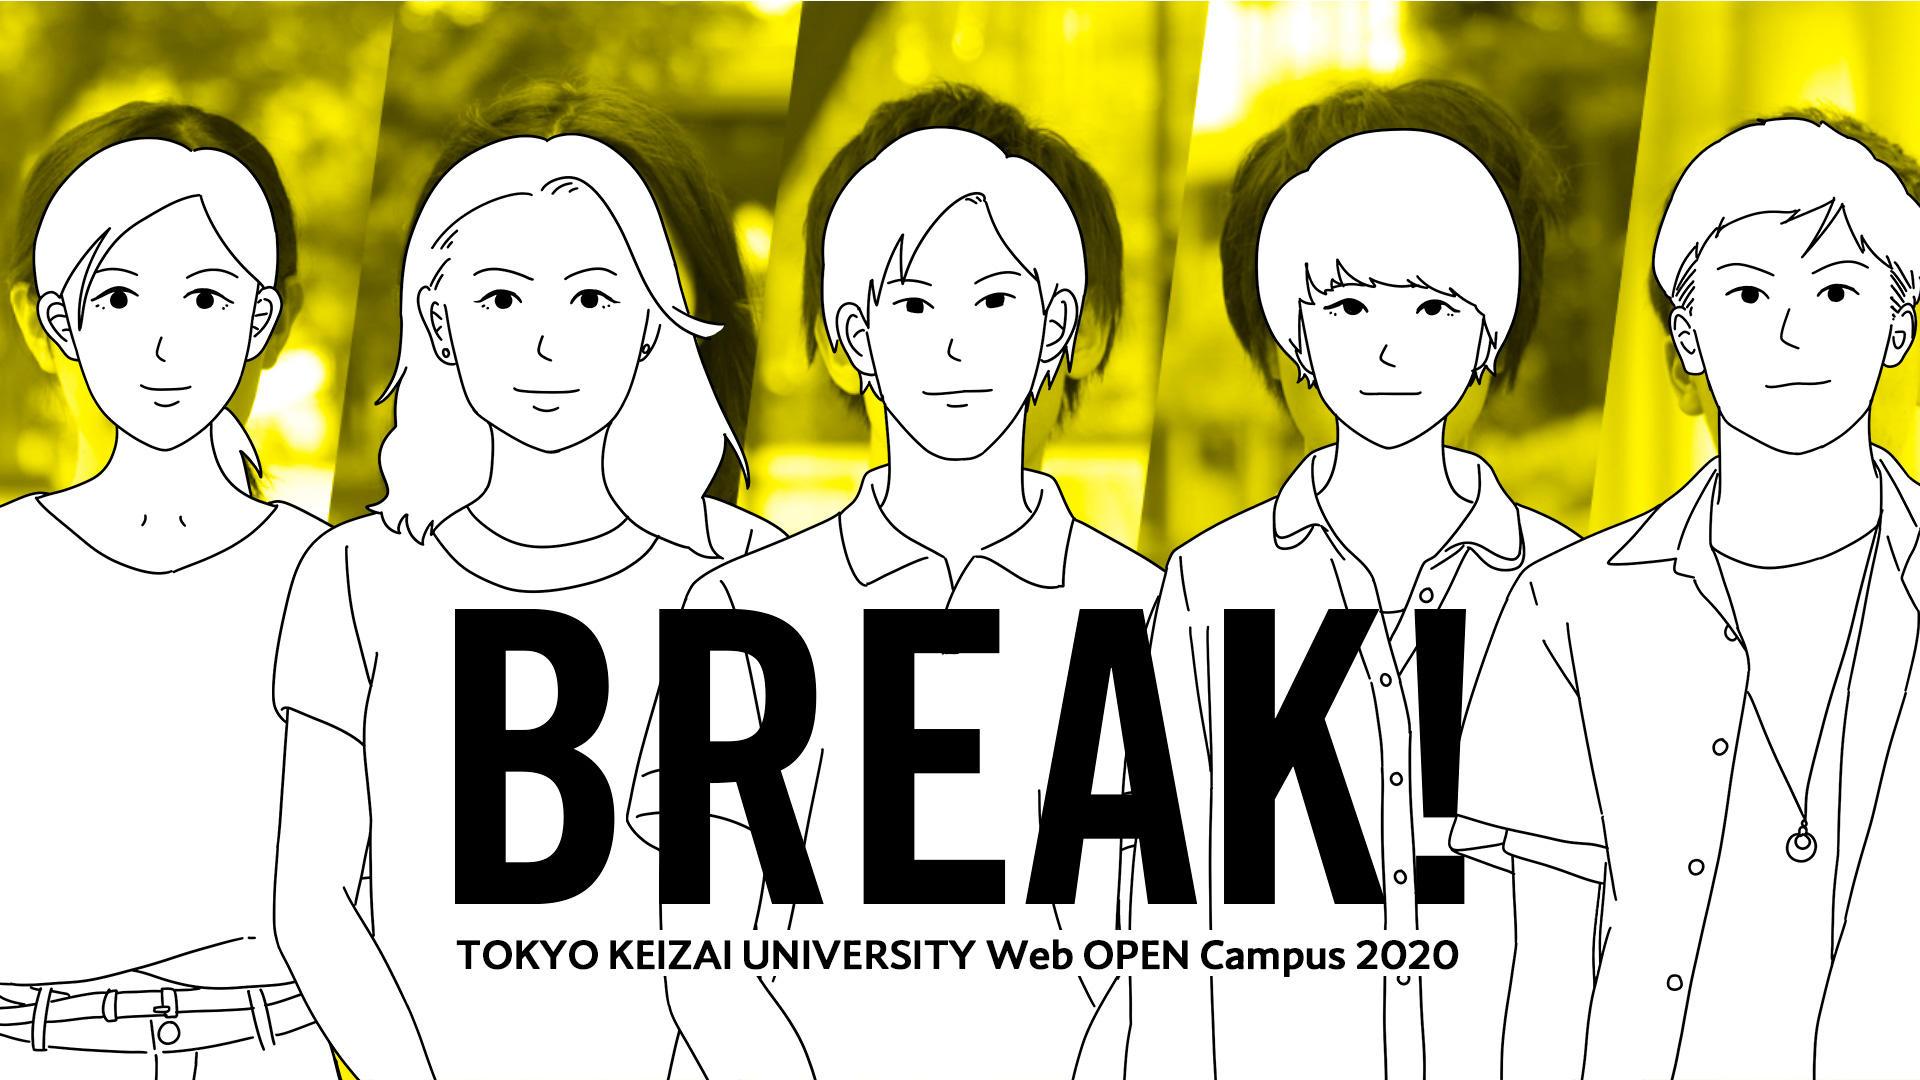 【BREAK!】WEBオープンキャンパス特設サイト開設 人数限定で来場型のキャンパスツアーやリアルタイム配信型の模擬授業も実施 -- 東京経済大学